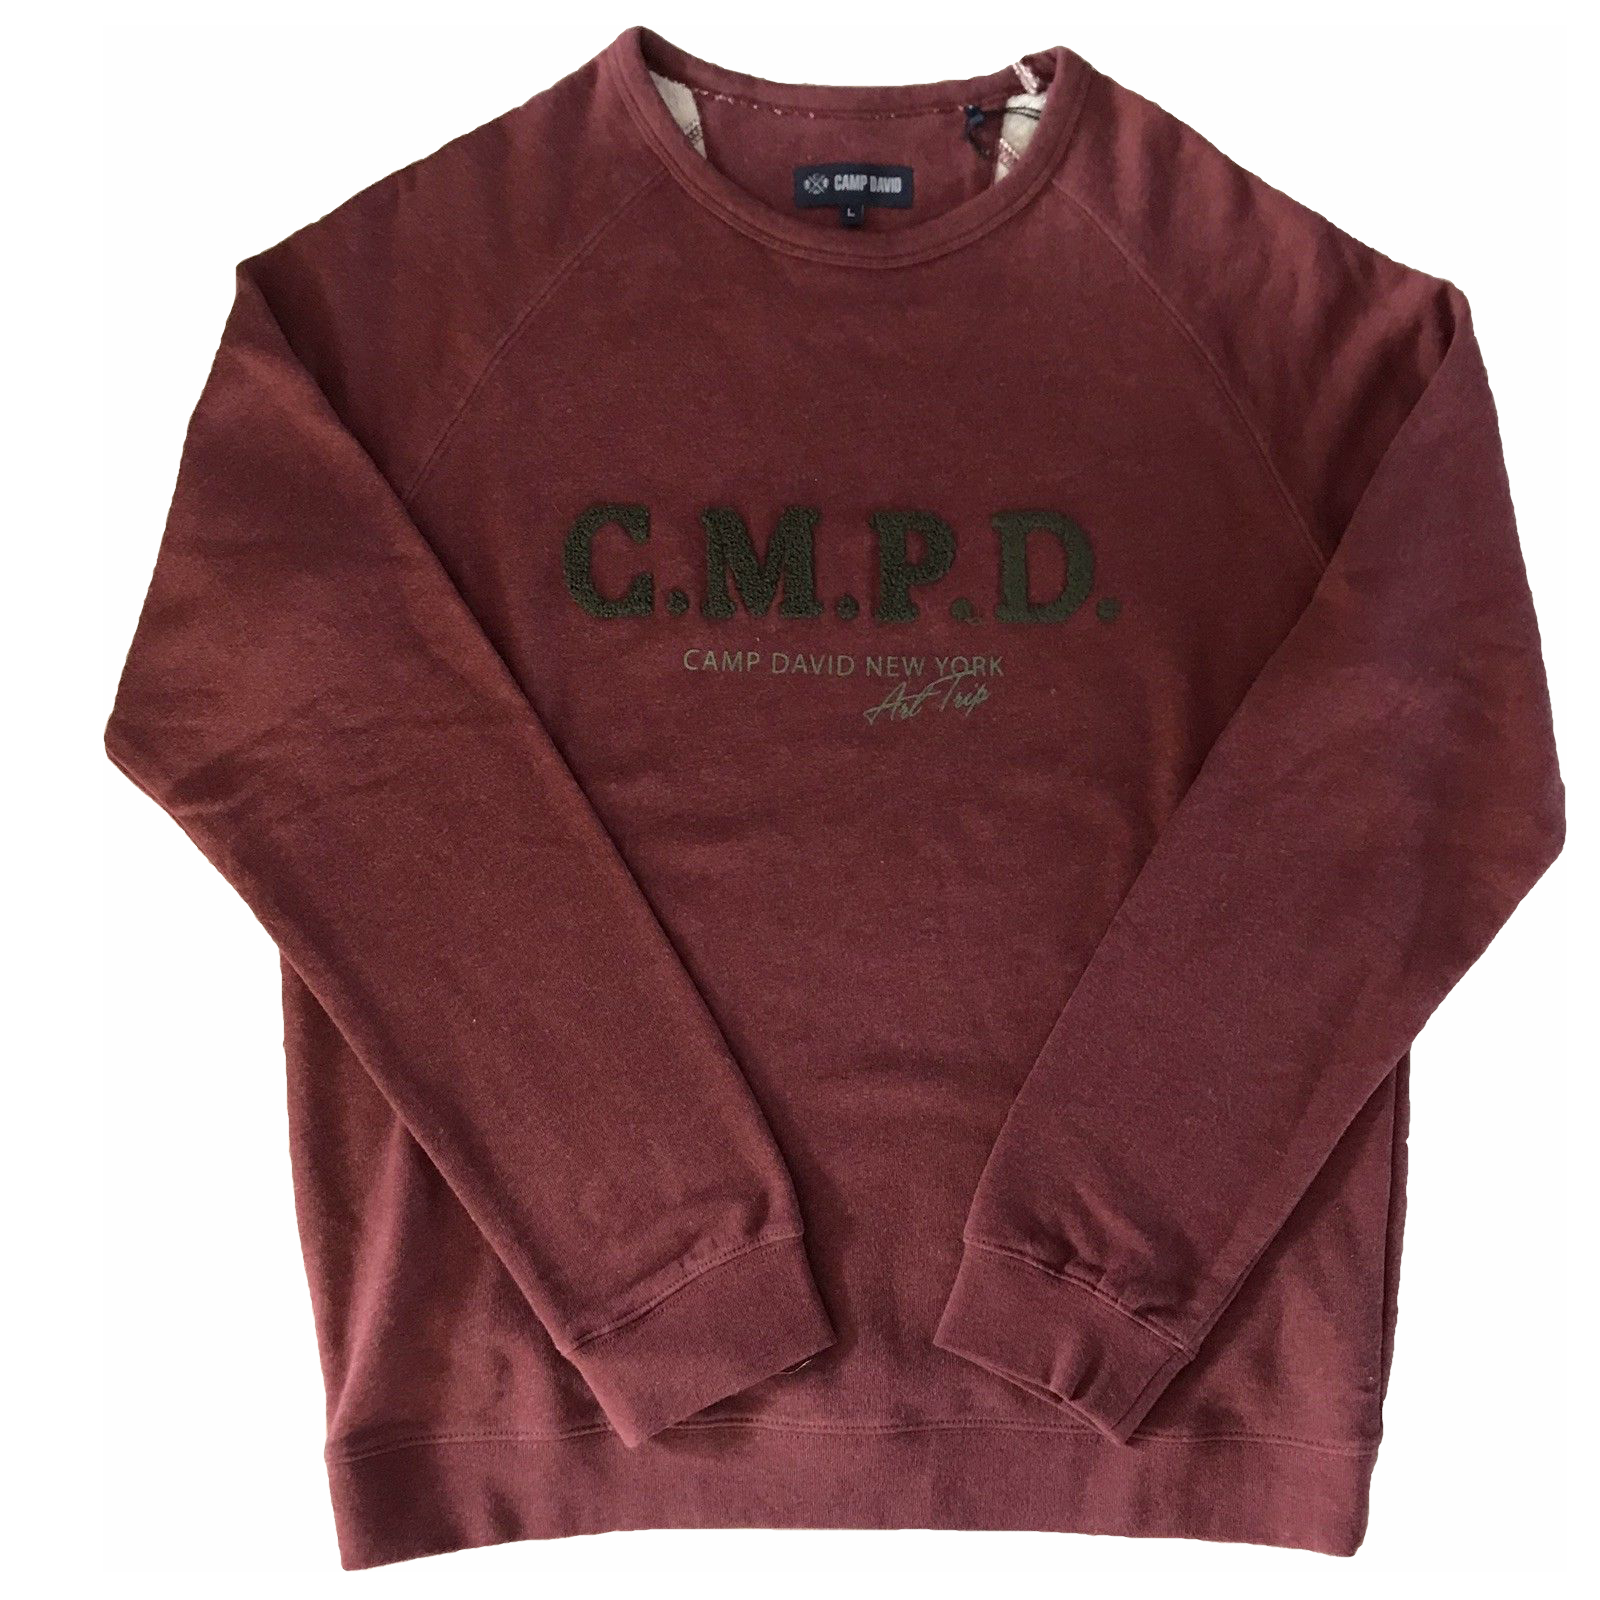 good best authentic classic styles Sweatshirt Herren David Camp Pullover langarm XXXL - M ...